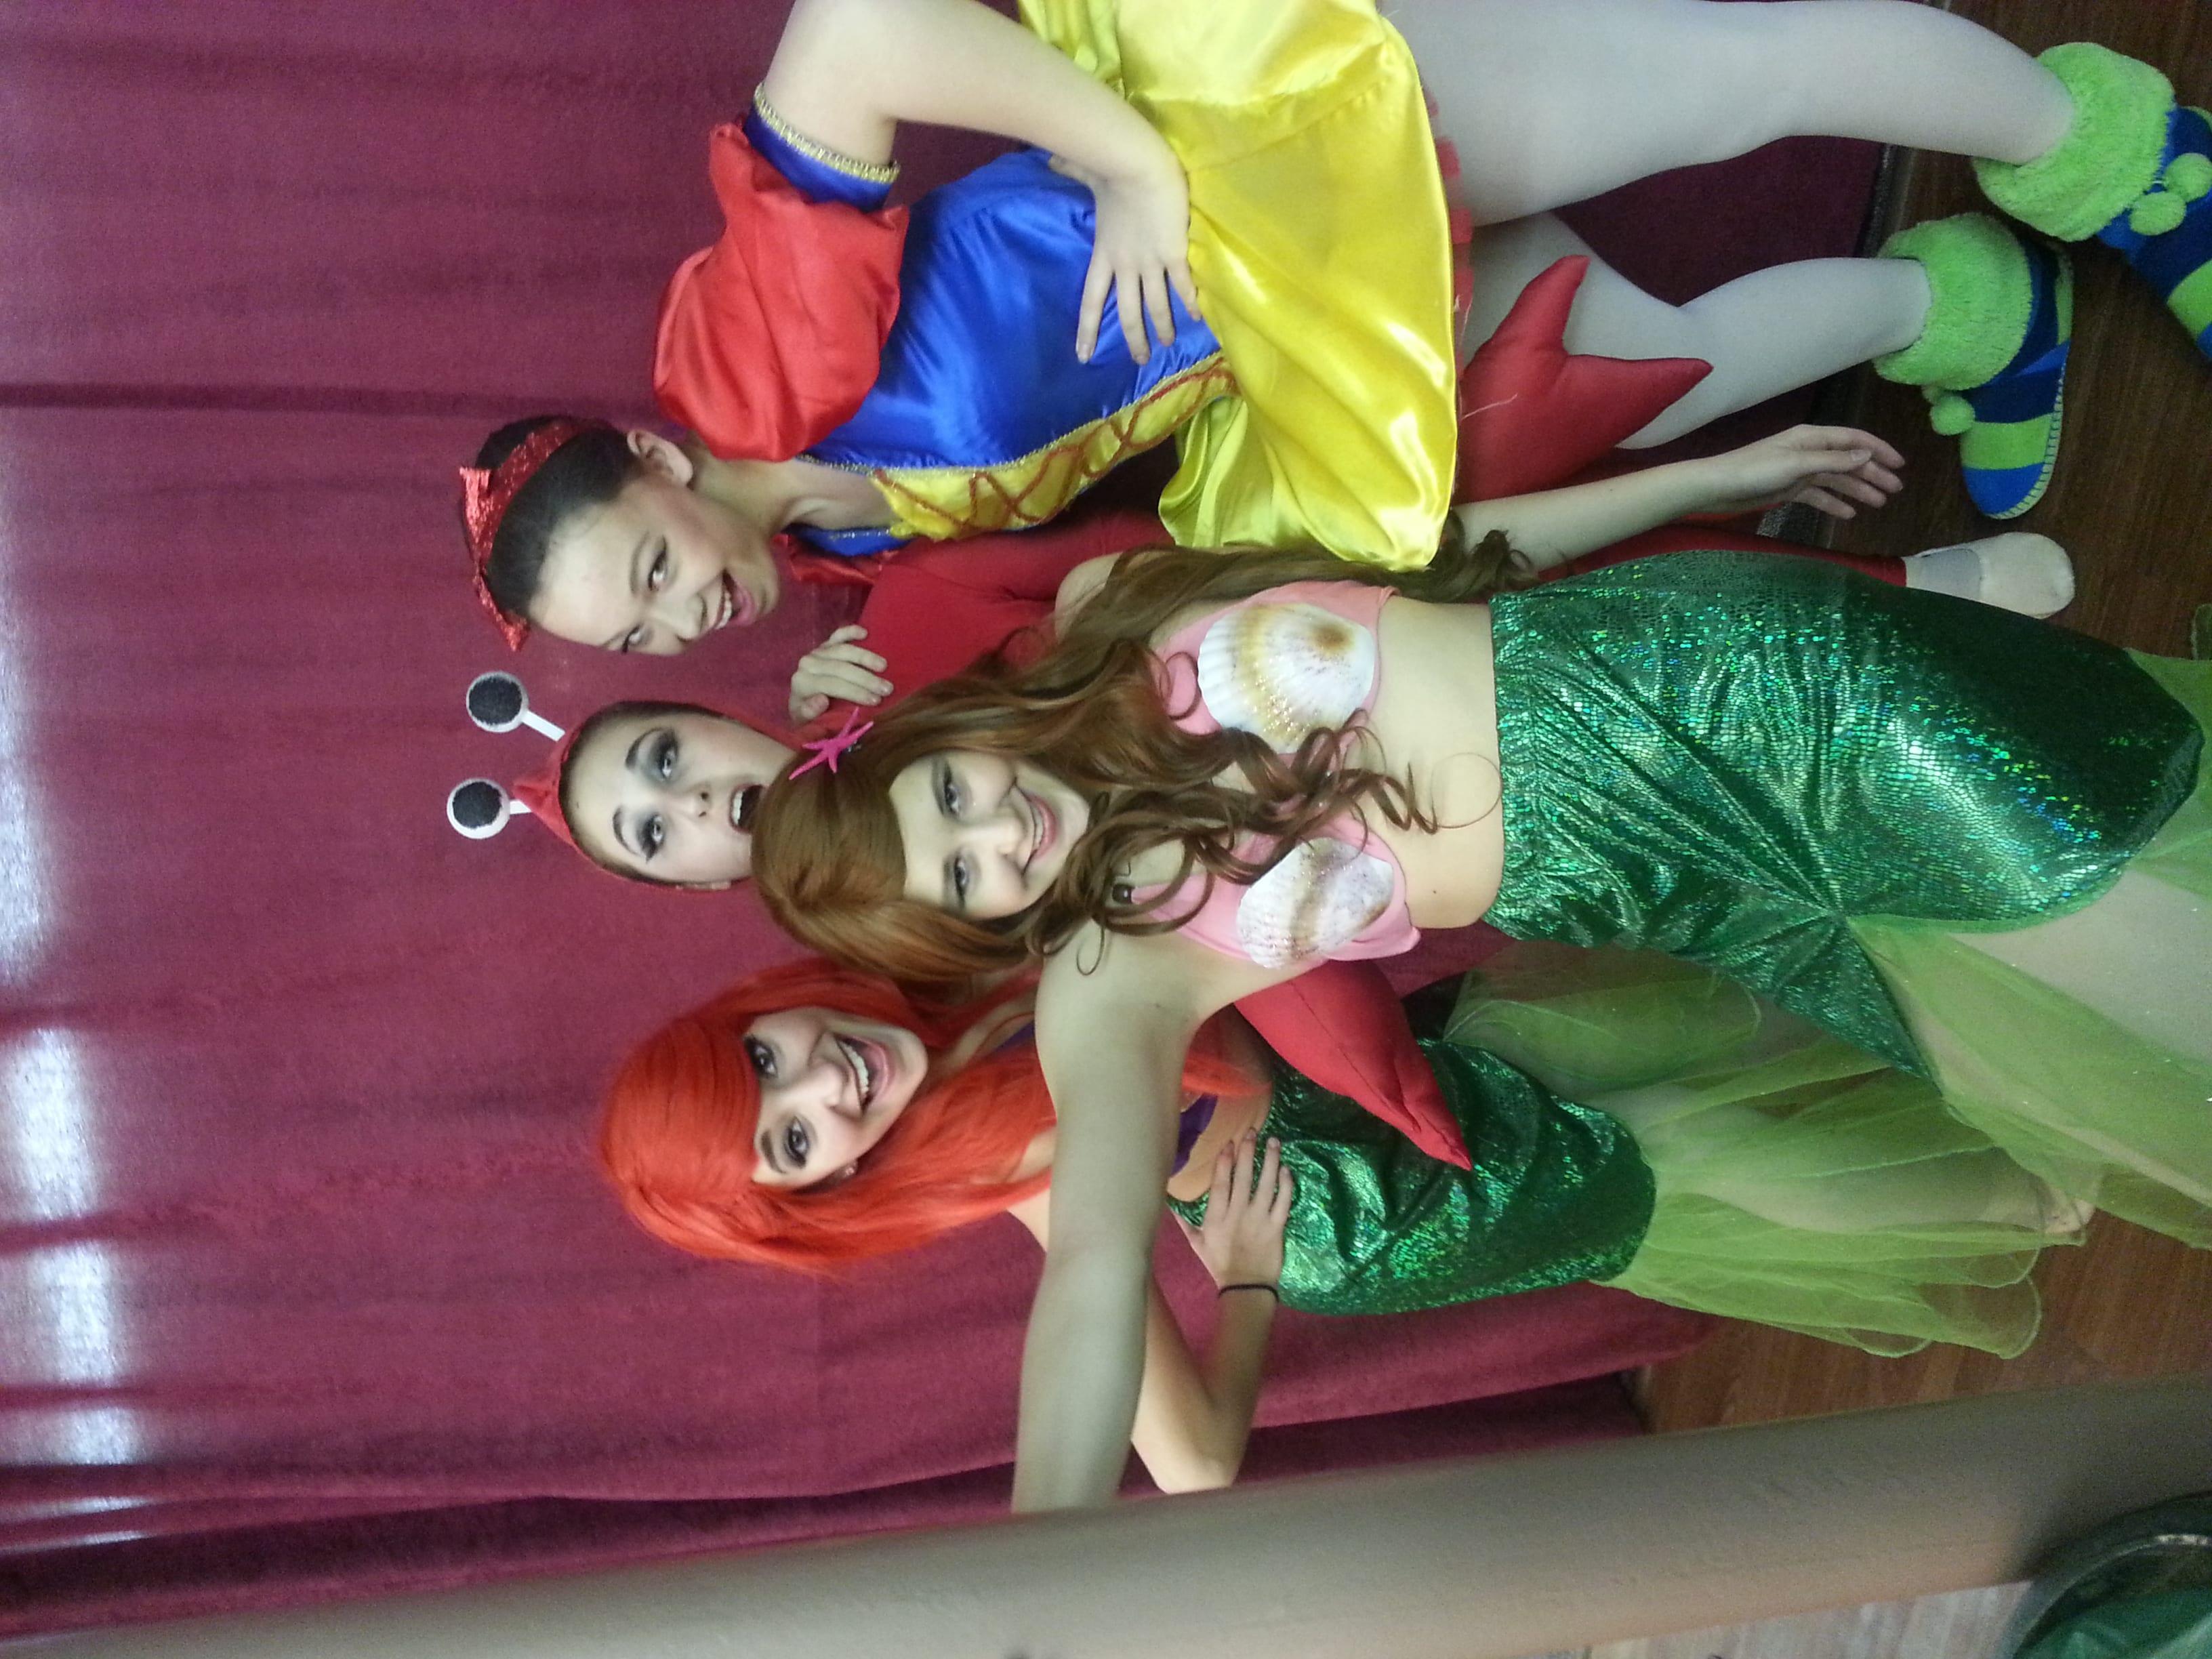 20130317_134717 – Beth Fowler School of Dance : Genoa and St. Charles Illinois